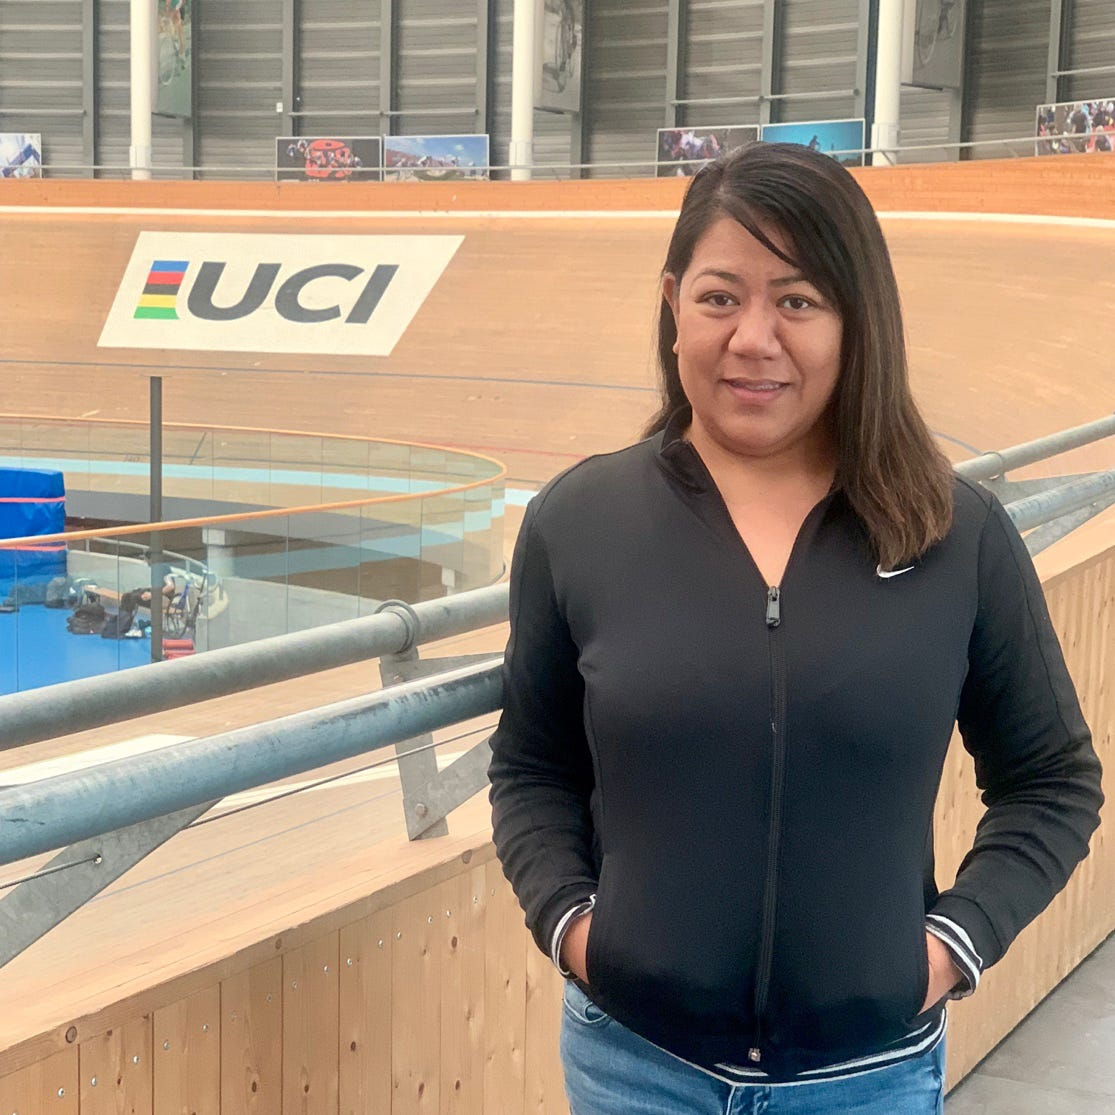 Cycling federation head certified as coach, mechanic from Union de Cycliste Internationale